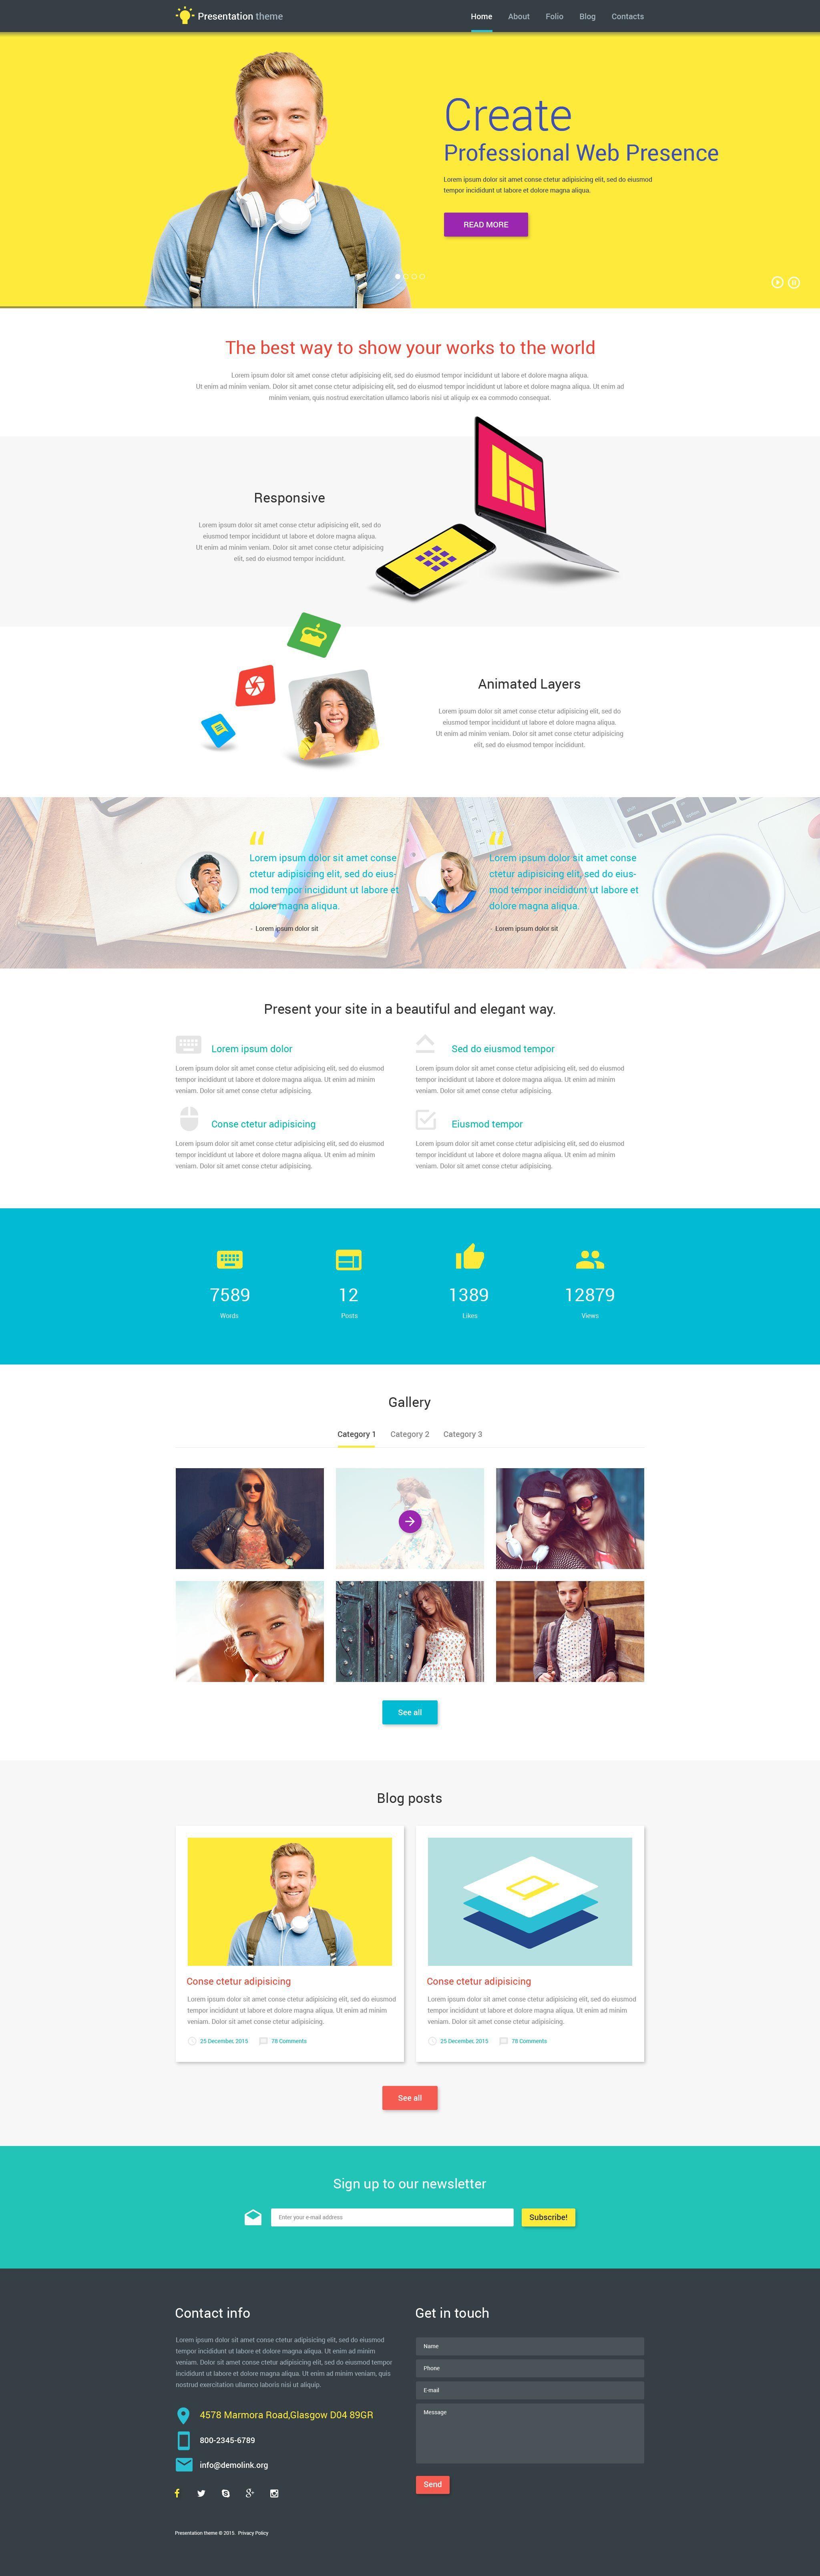 Top 20 Ecommerce Website Design Firm In Singapore In 2020 Wordpress Web Design Ecommerce Website Design Fun Website Design